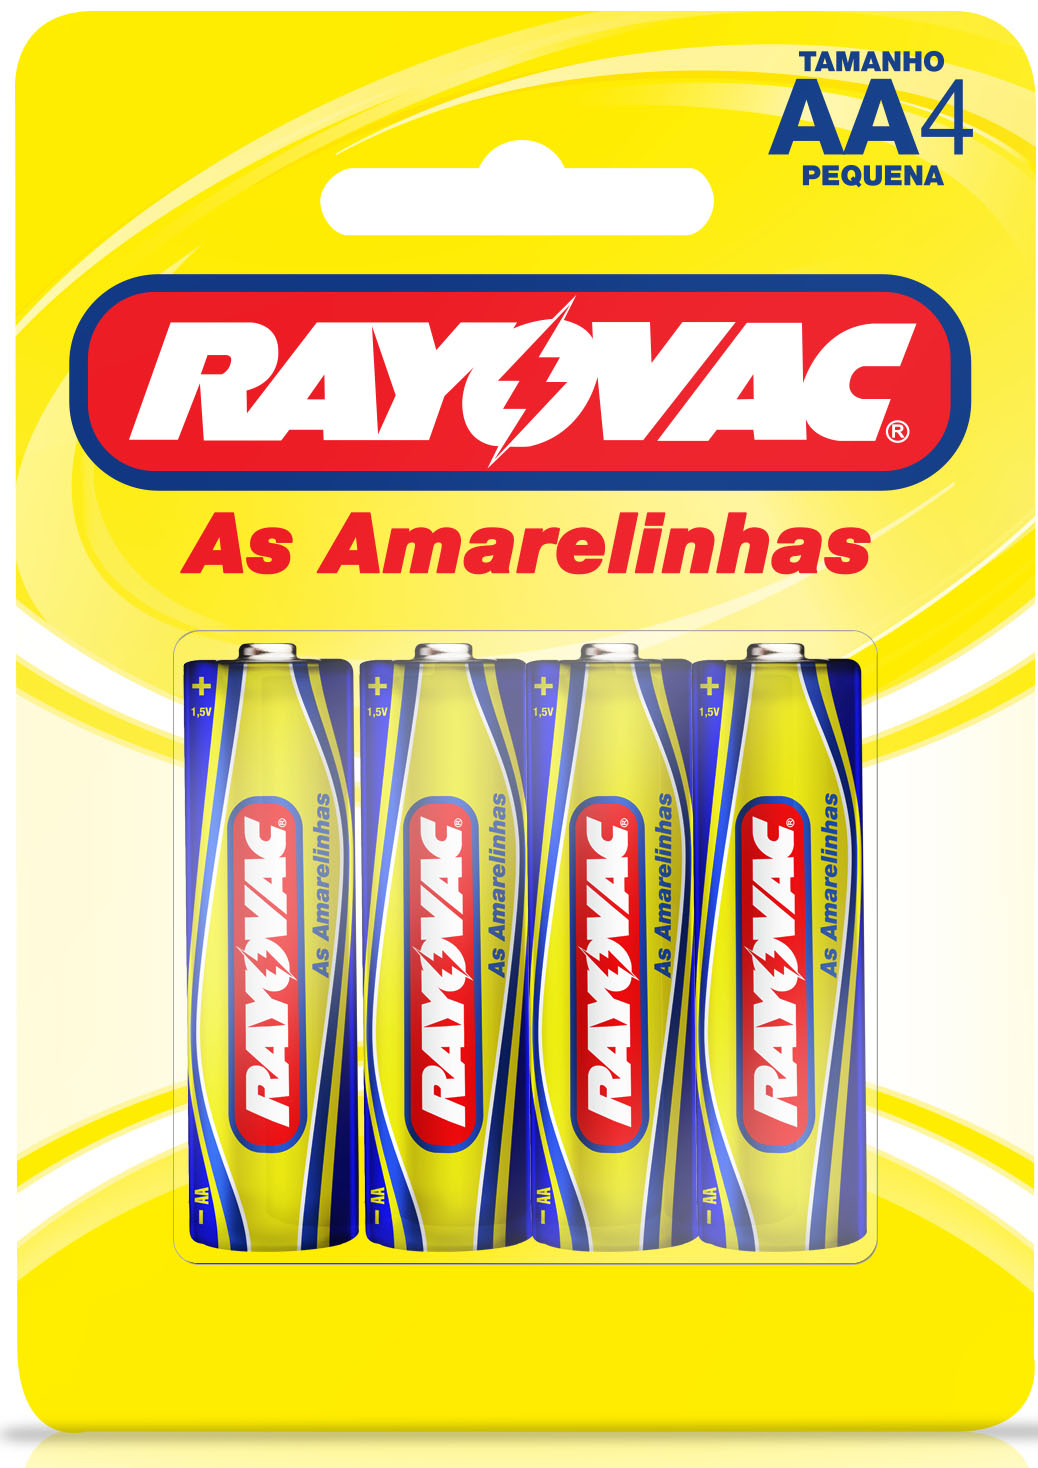 PILHA RAY AMARELINHAS PQ AA4 1X4(48)